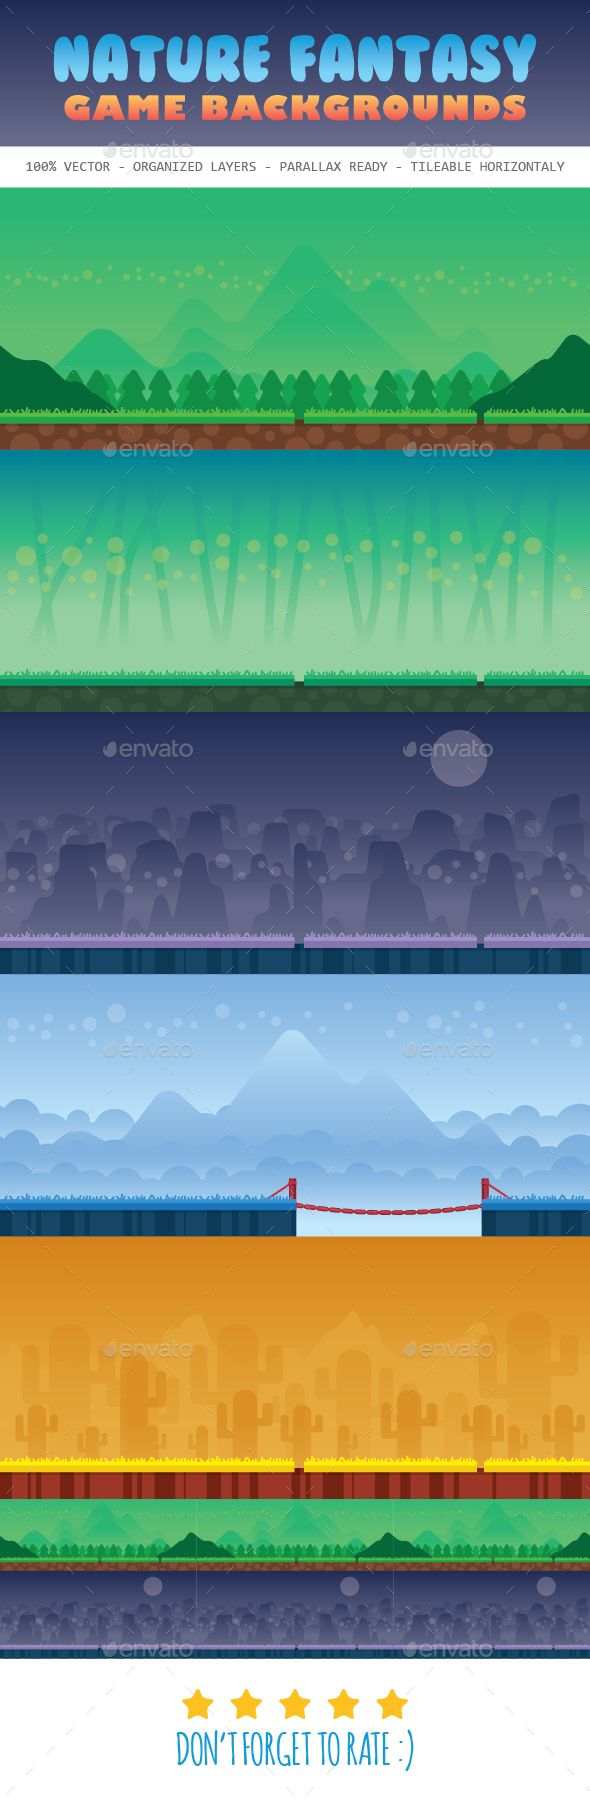 Nature Fantasy Game Background